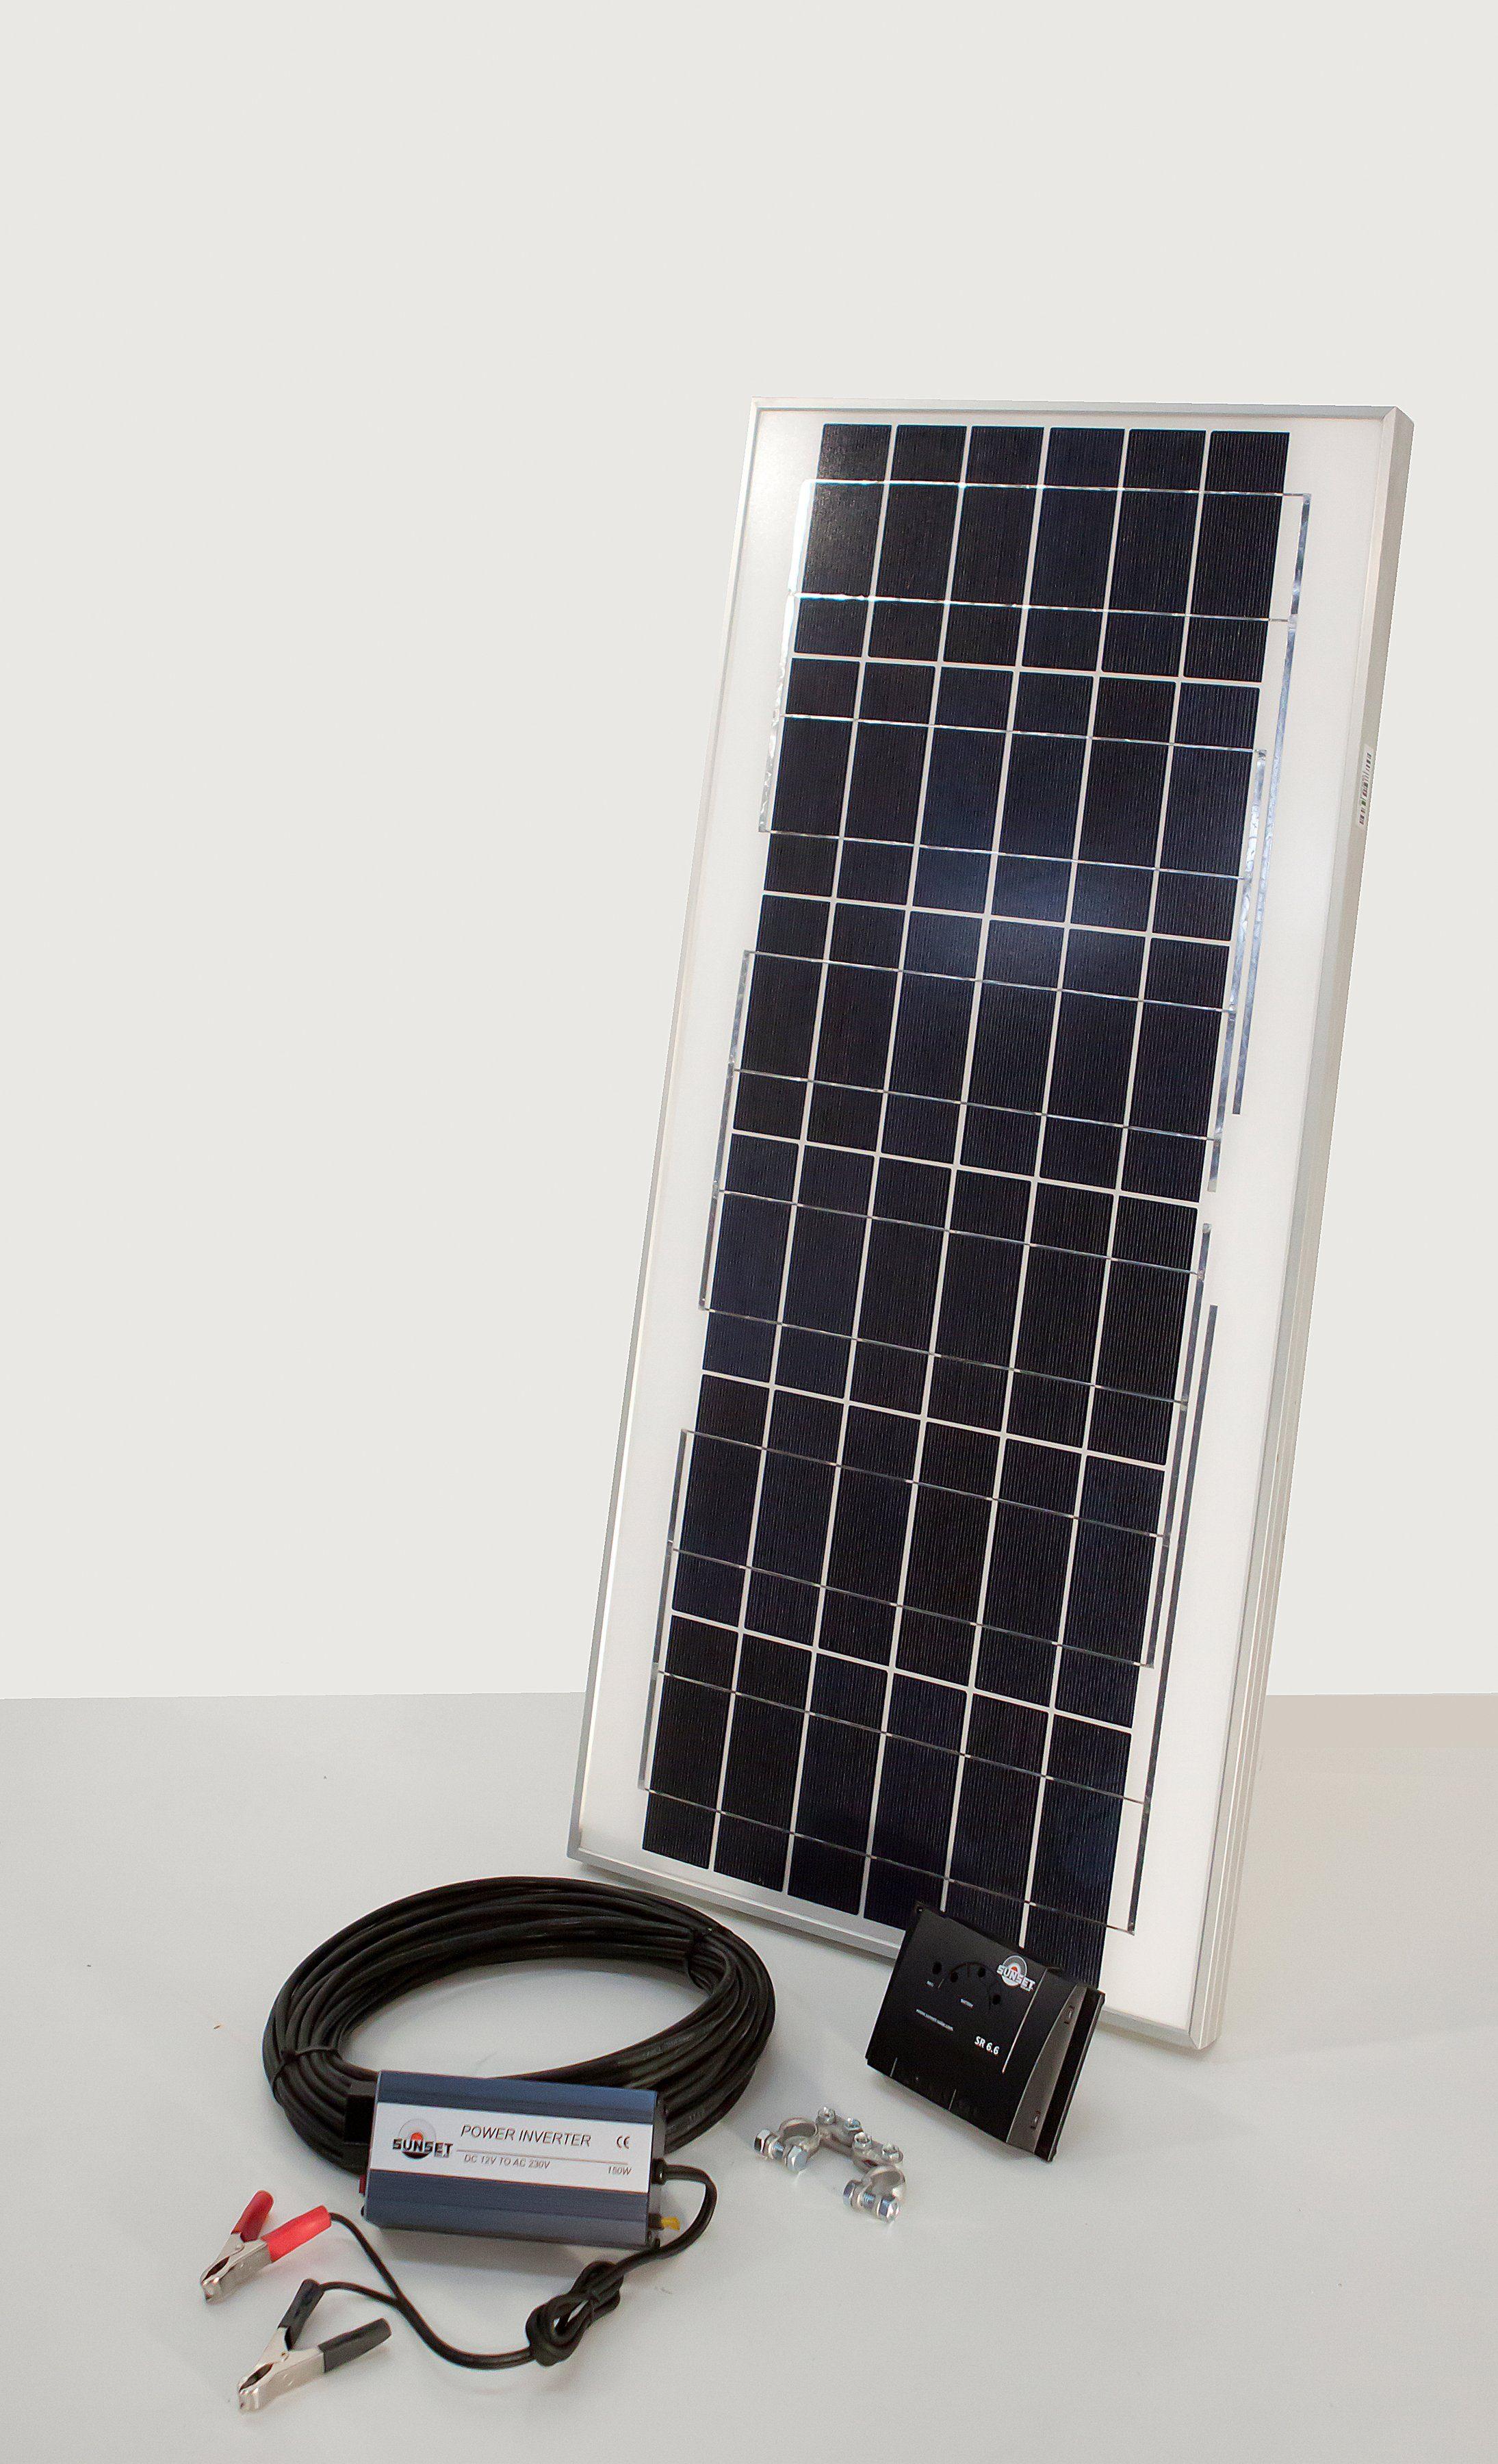 Set: Solareinsteiger-Set »Solarstrom-Einsteiger-Set «, 45 Watt 230 V